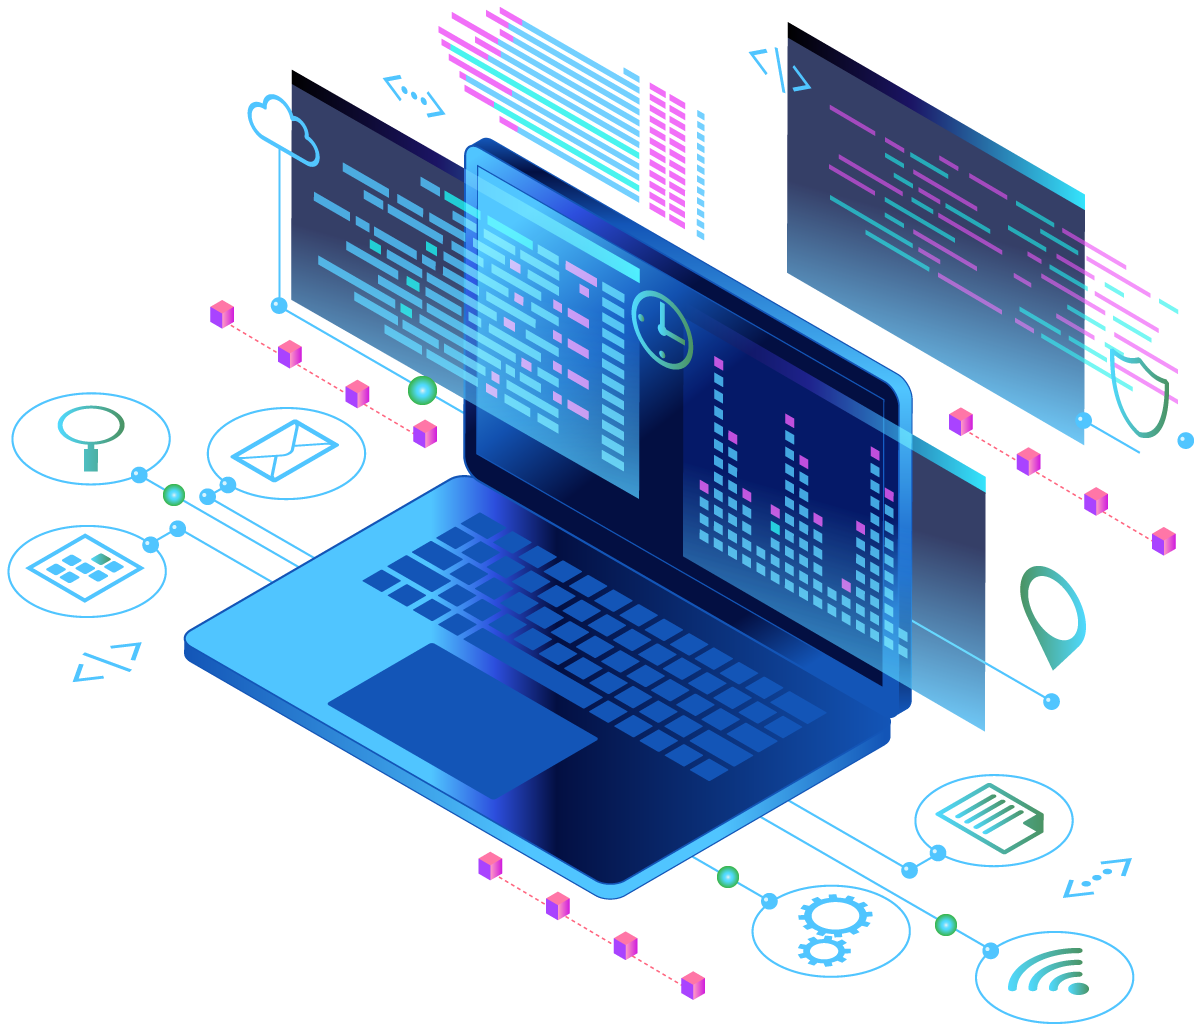 web-development-illustration-2